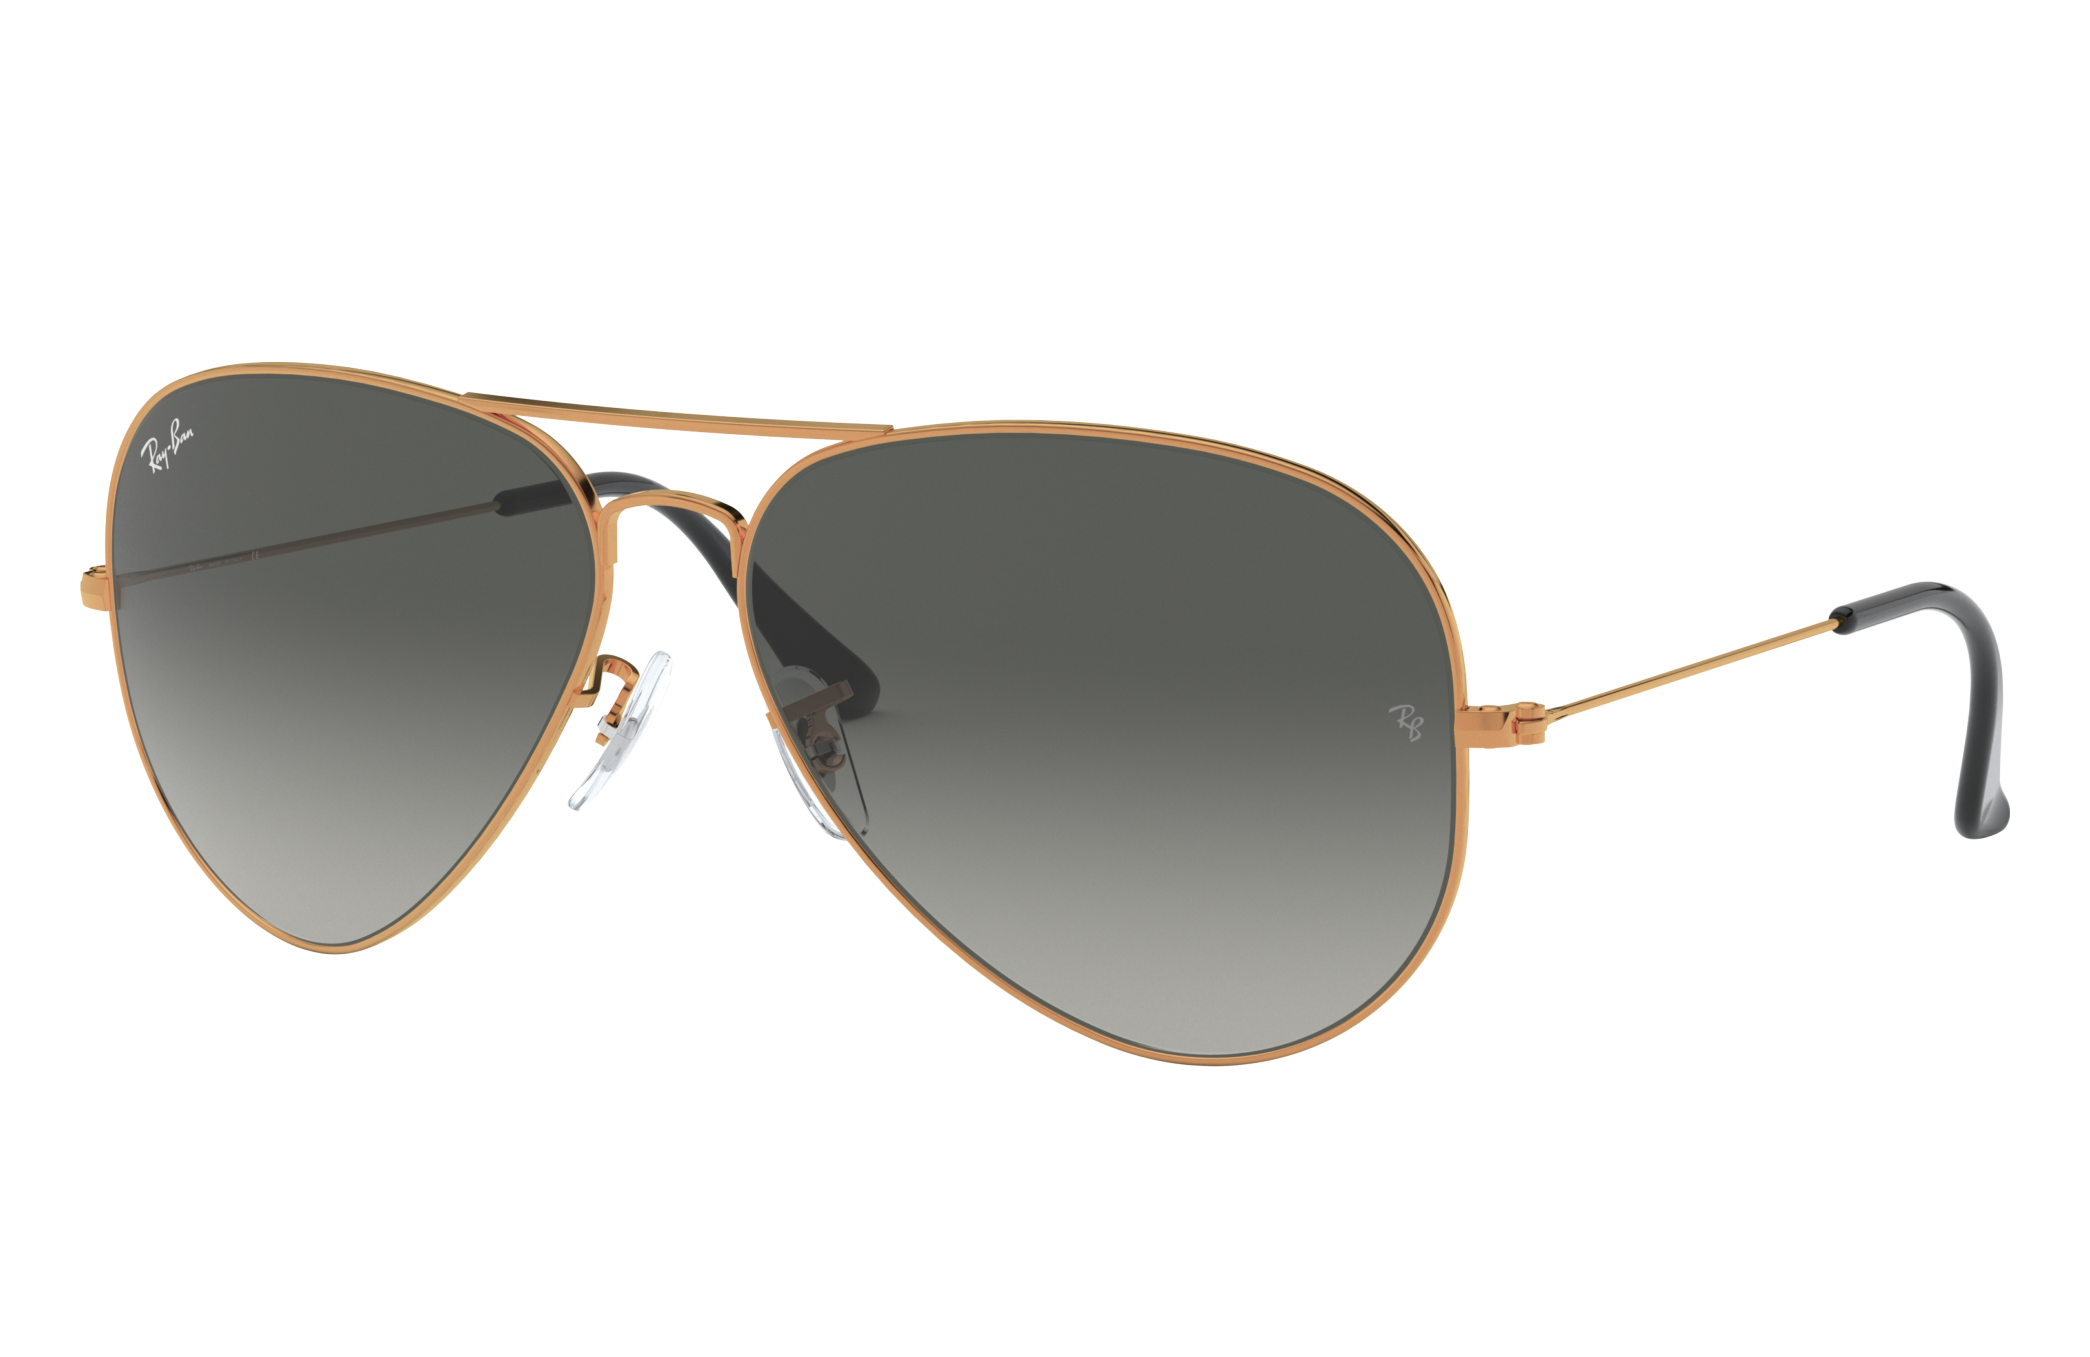 Ray-Ban Aviator Gradient Bronze-Copper, Gray Lenses - RB3026